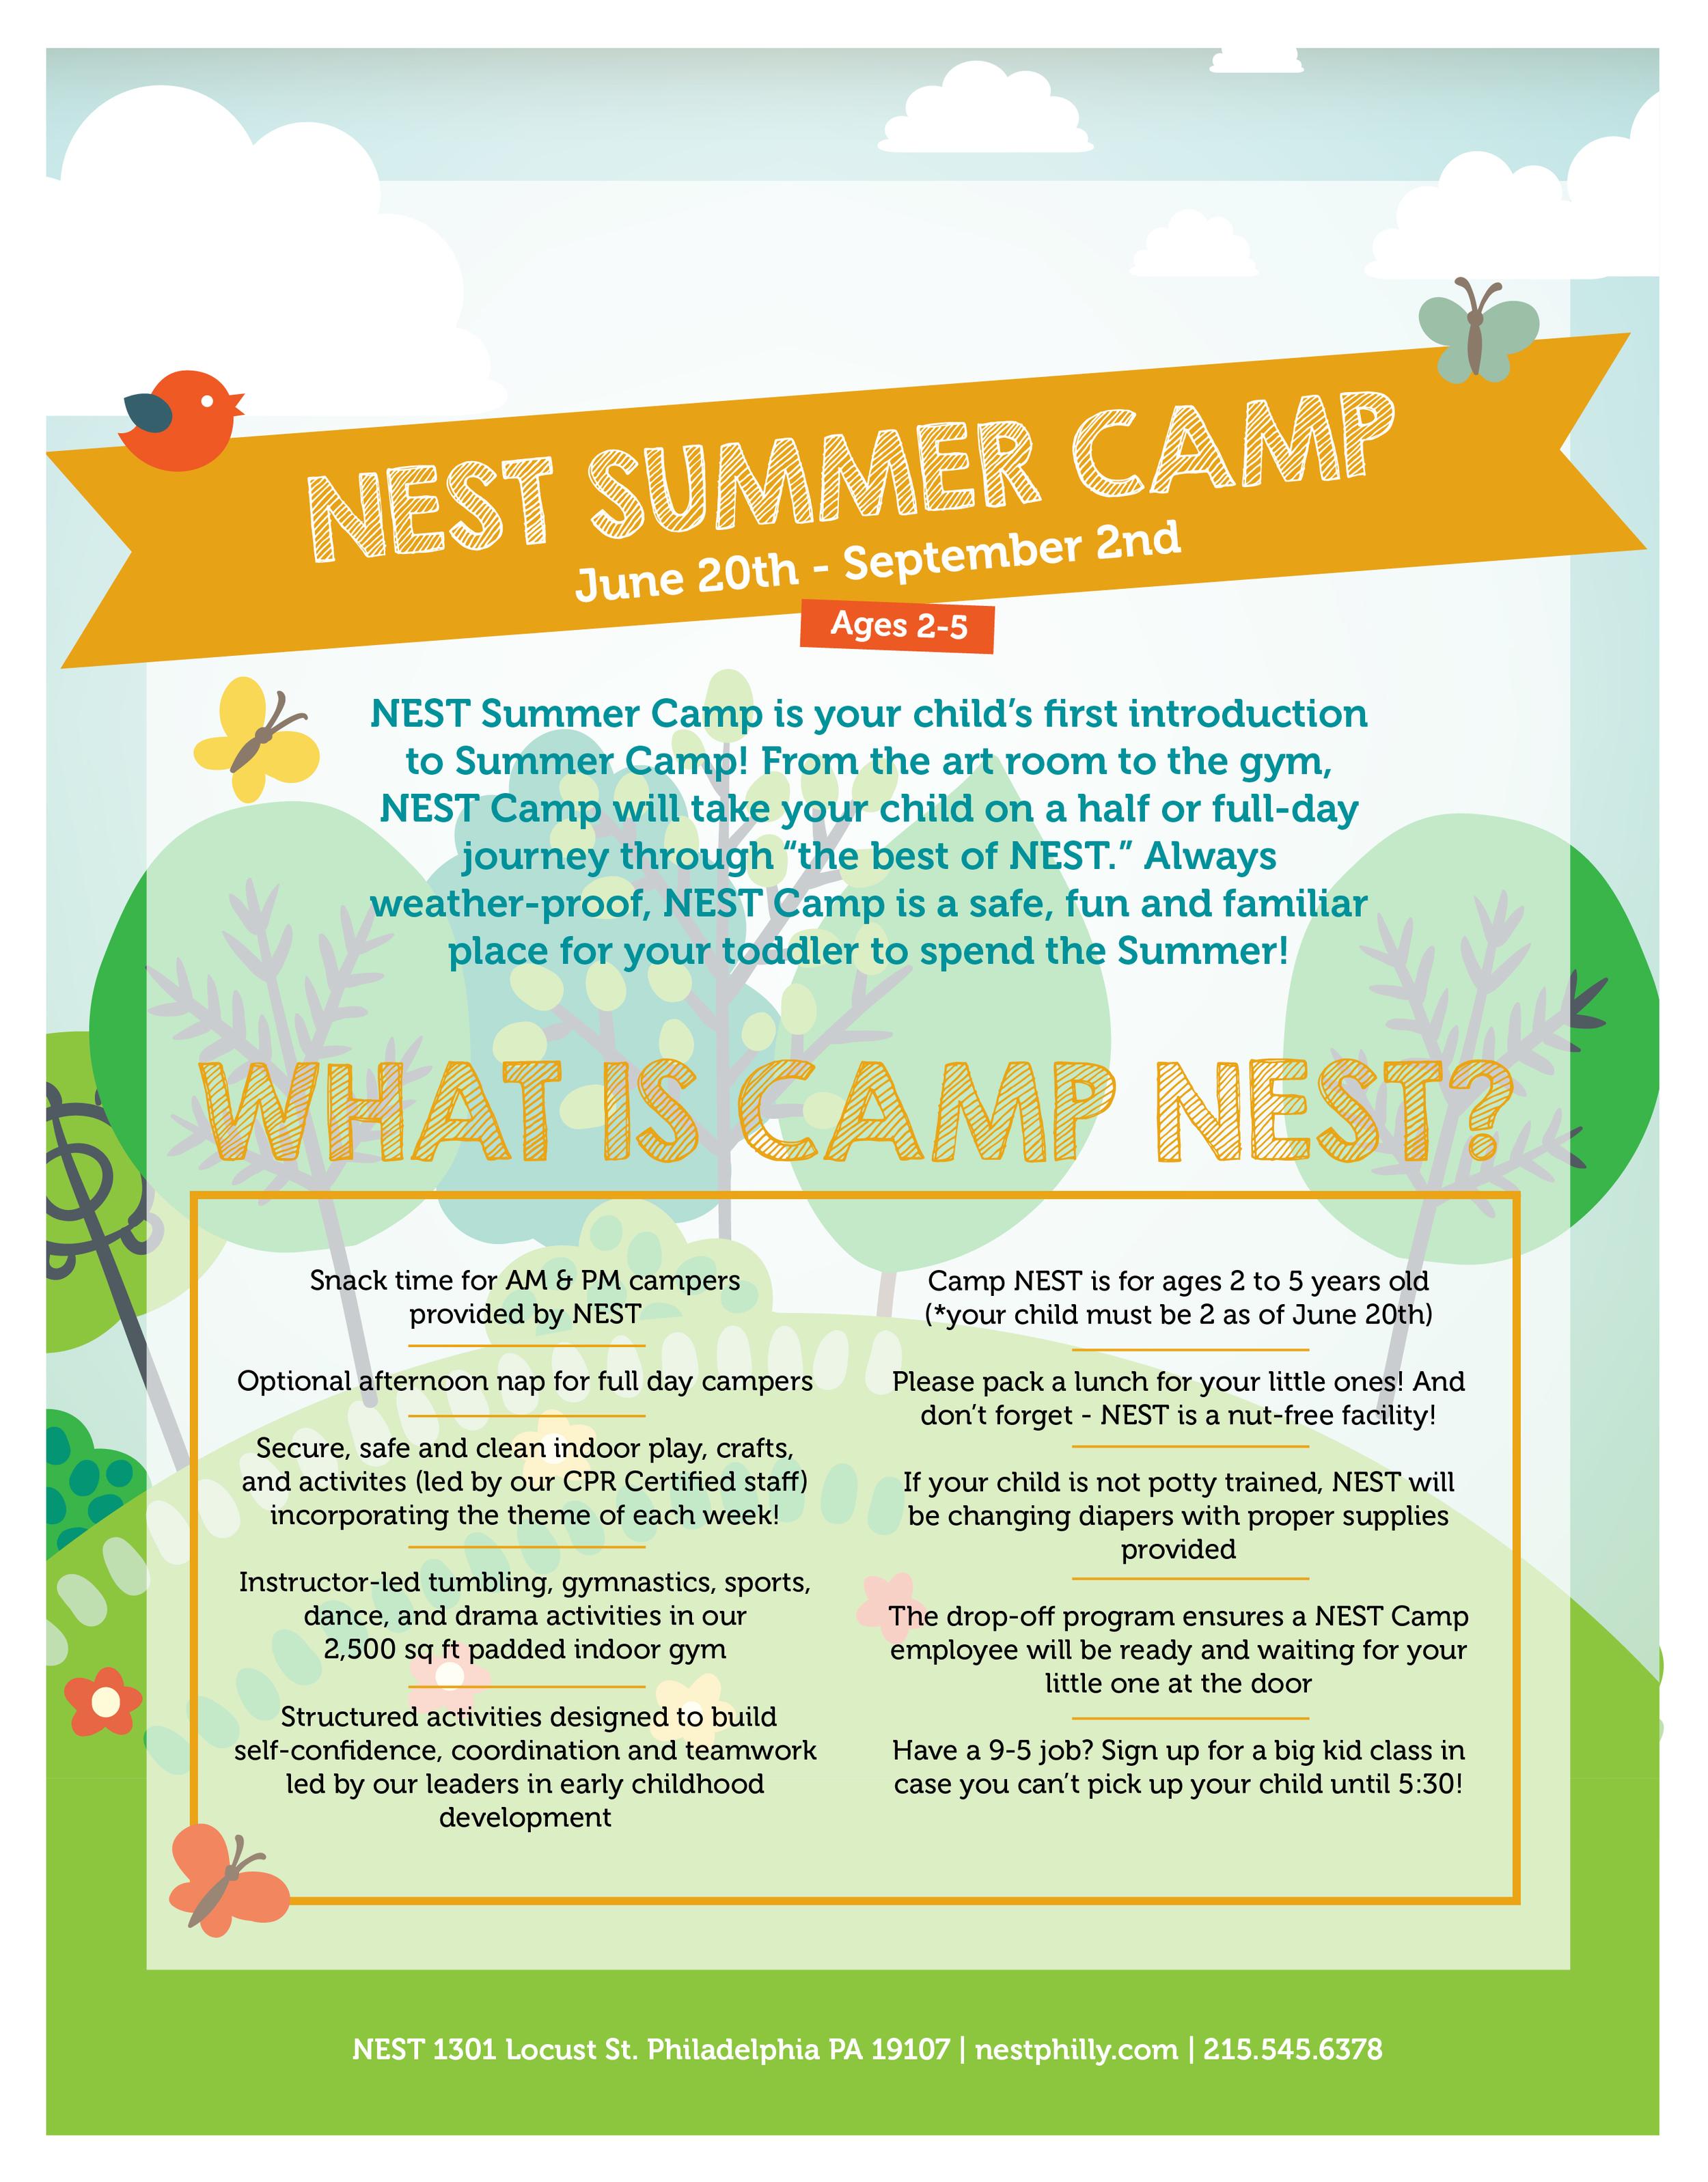 NestSummerCampFlyer_2016-08 copy.jpg